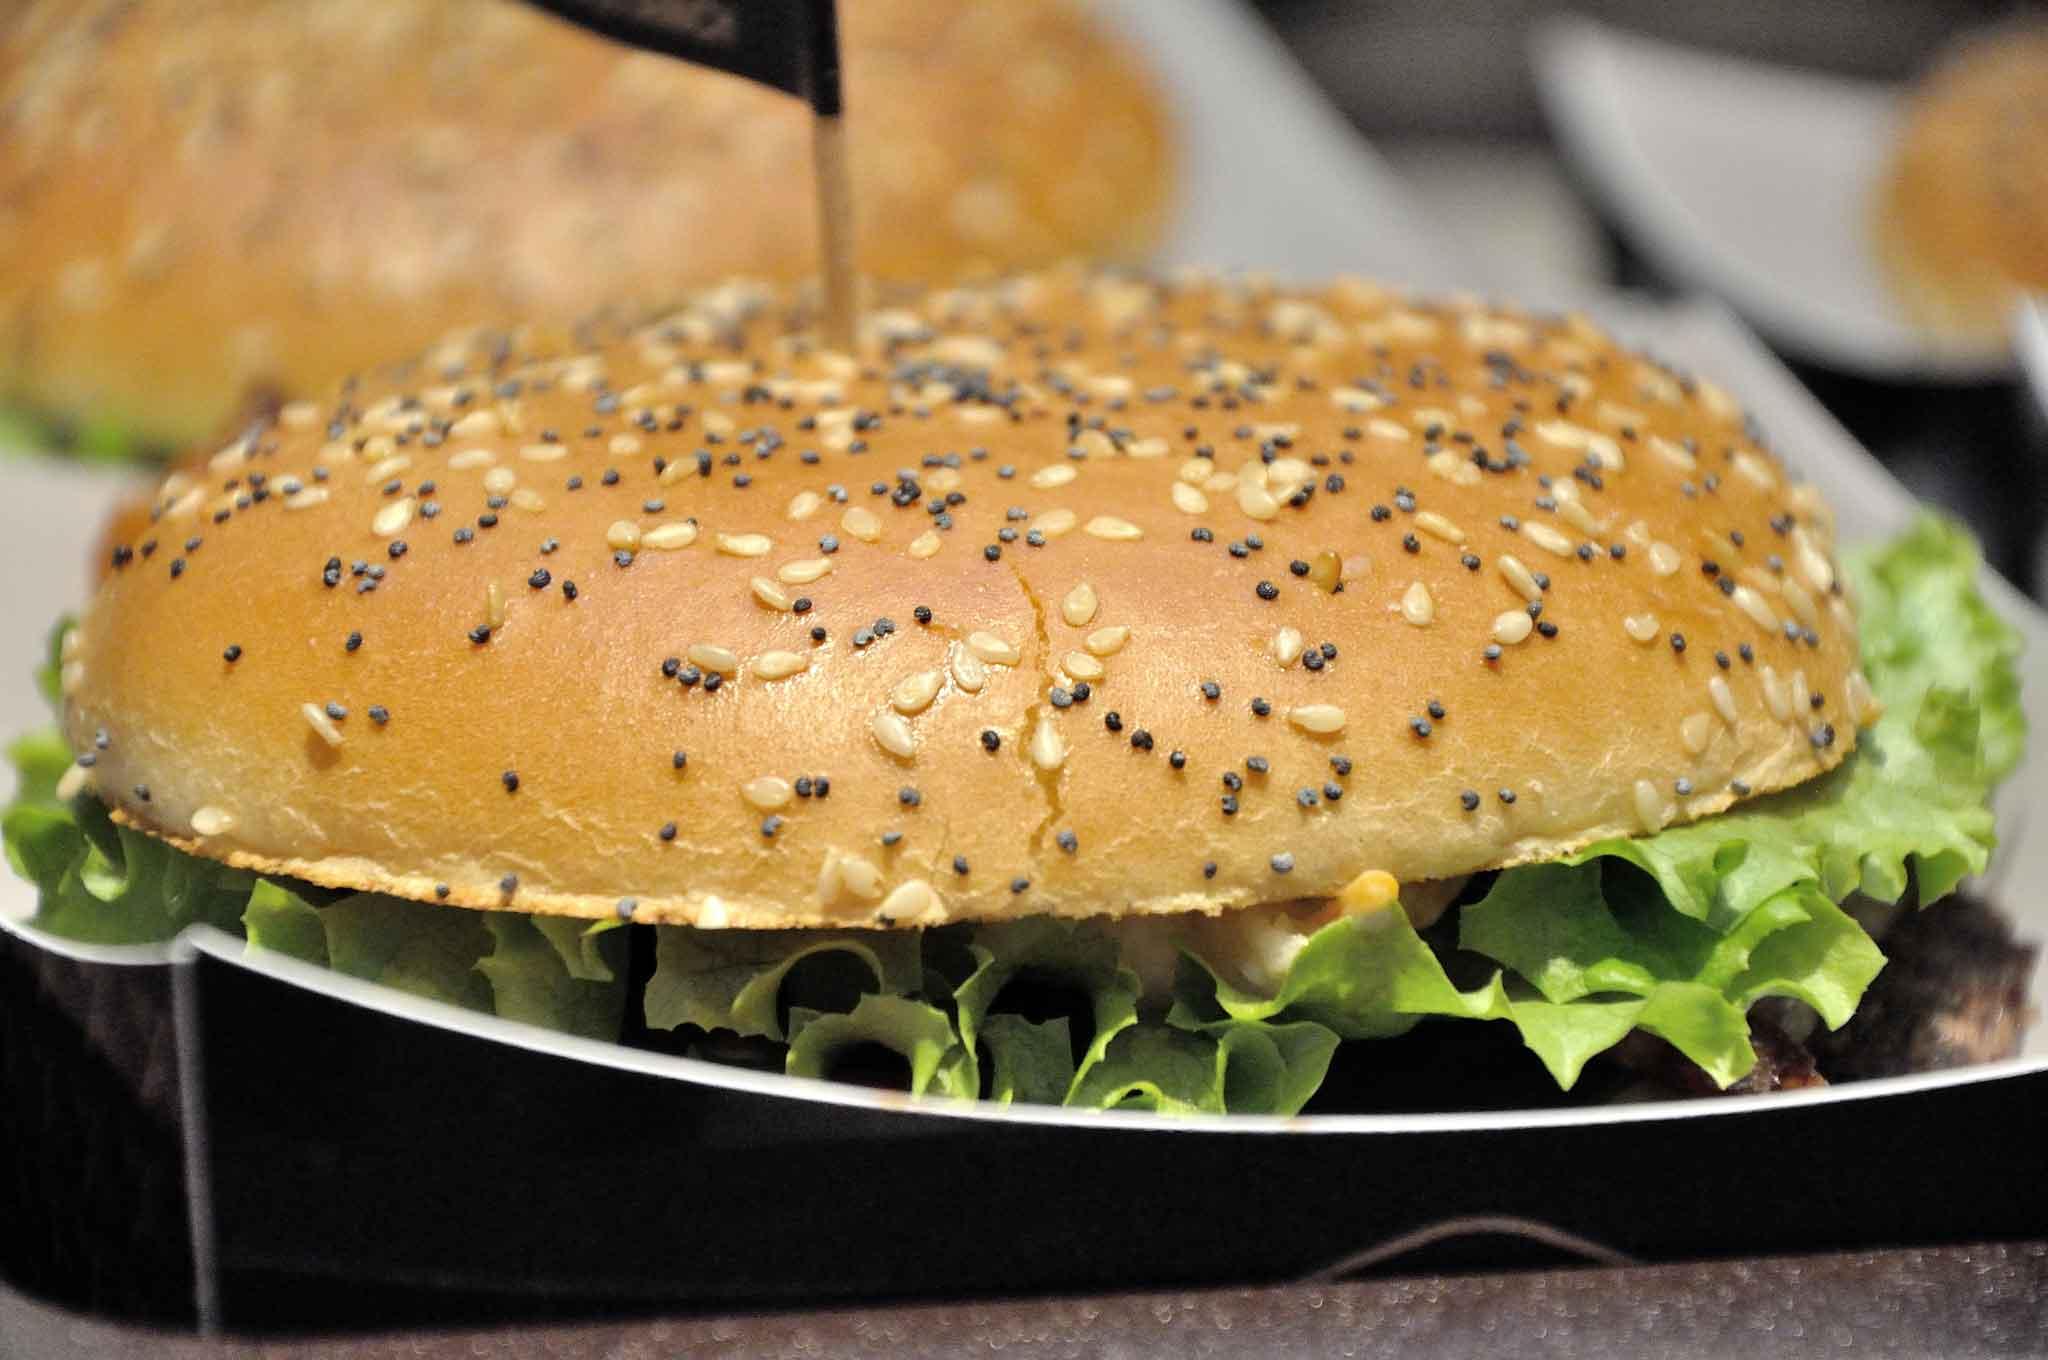 hamburger mcdonald's Maximo